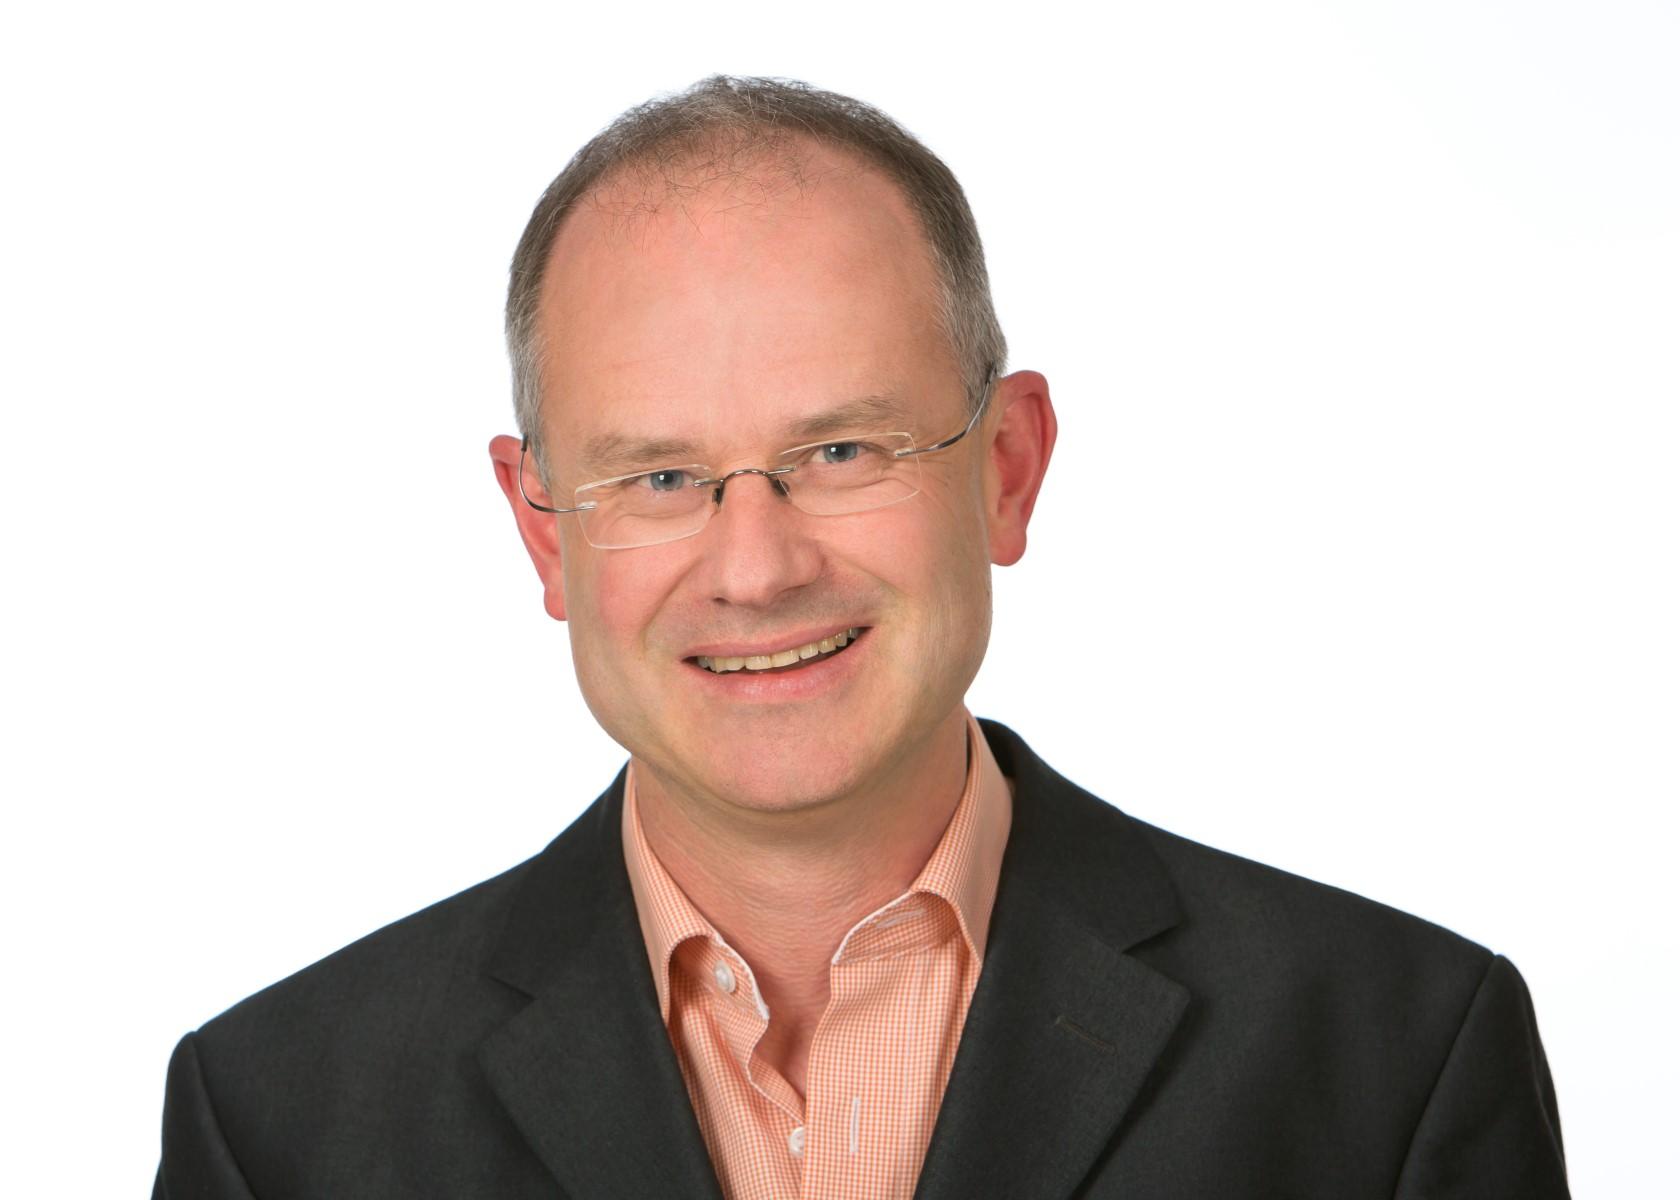 Markus Braun BfP